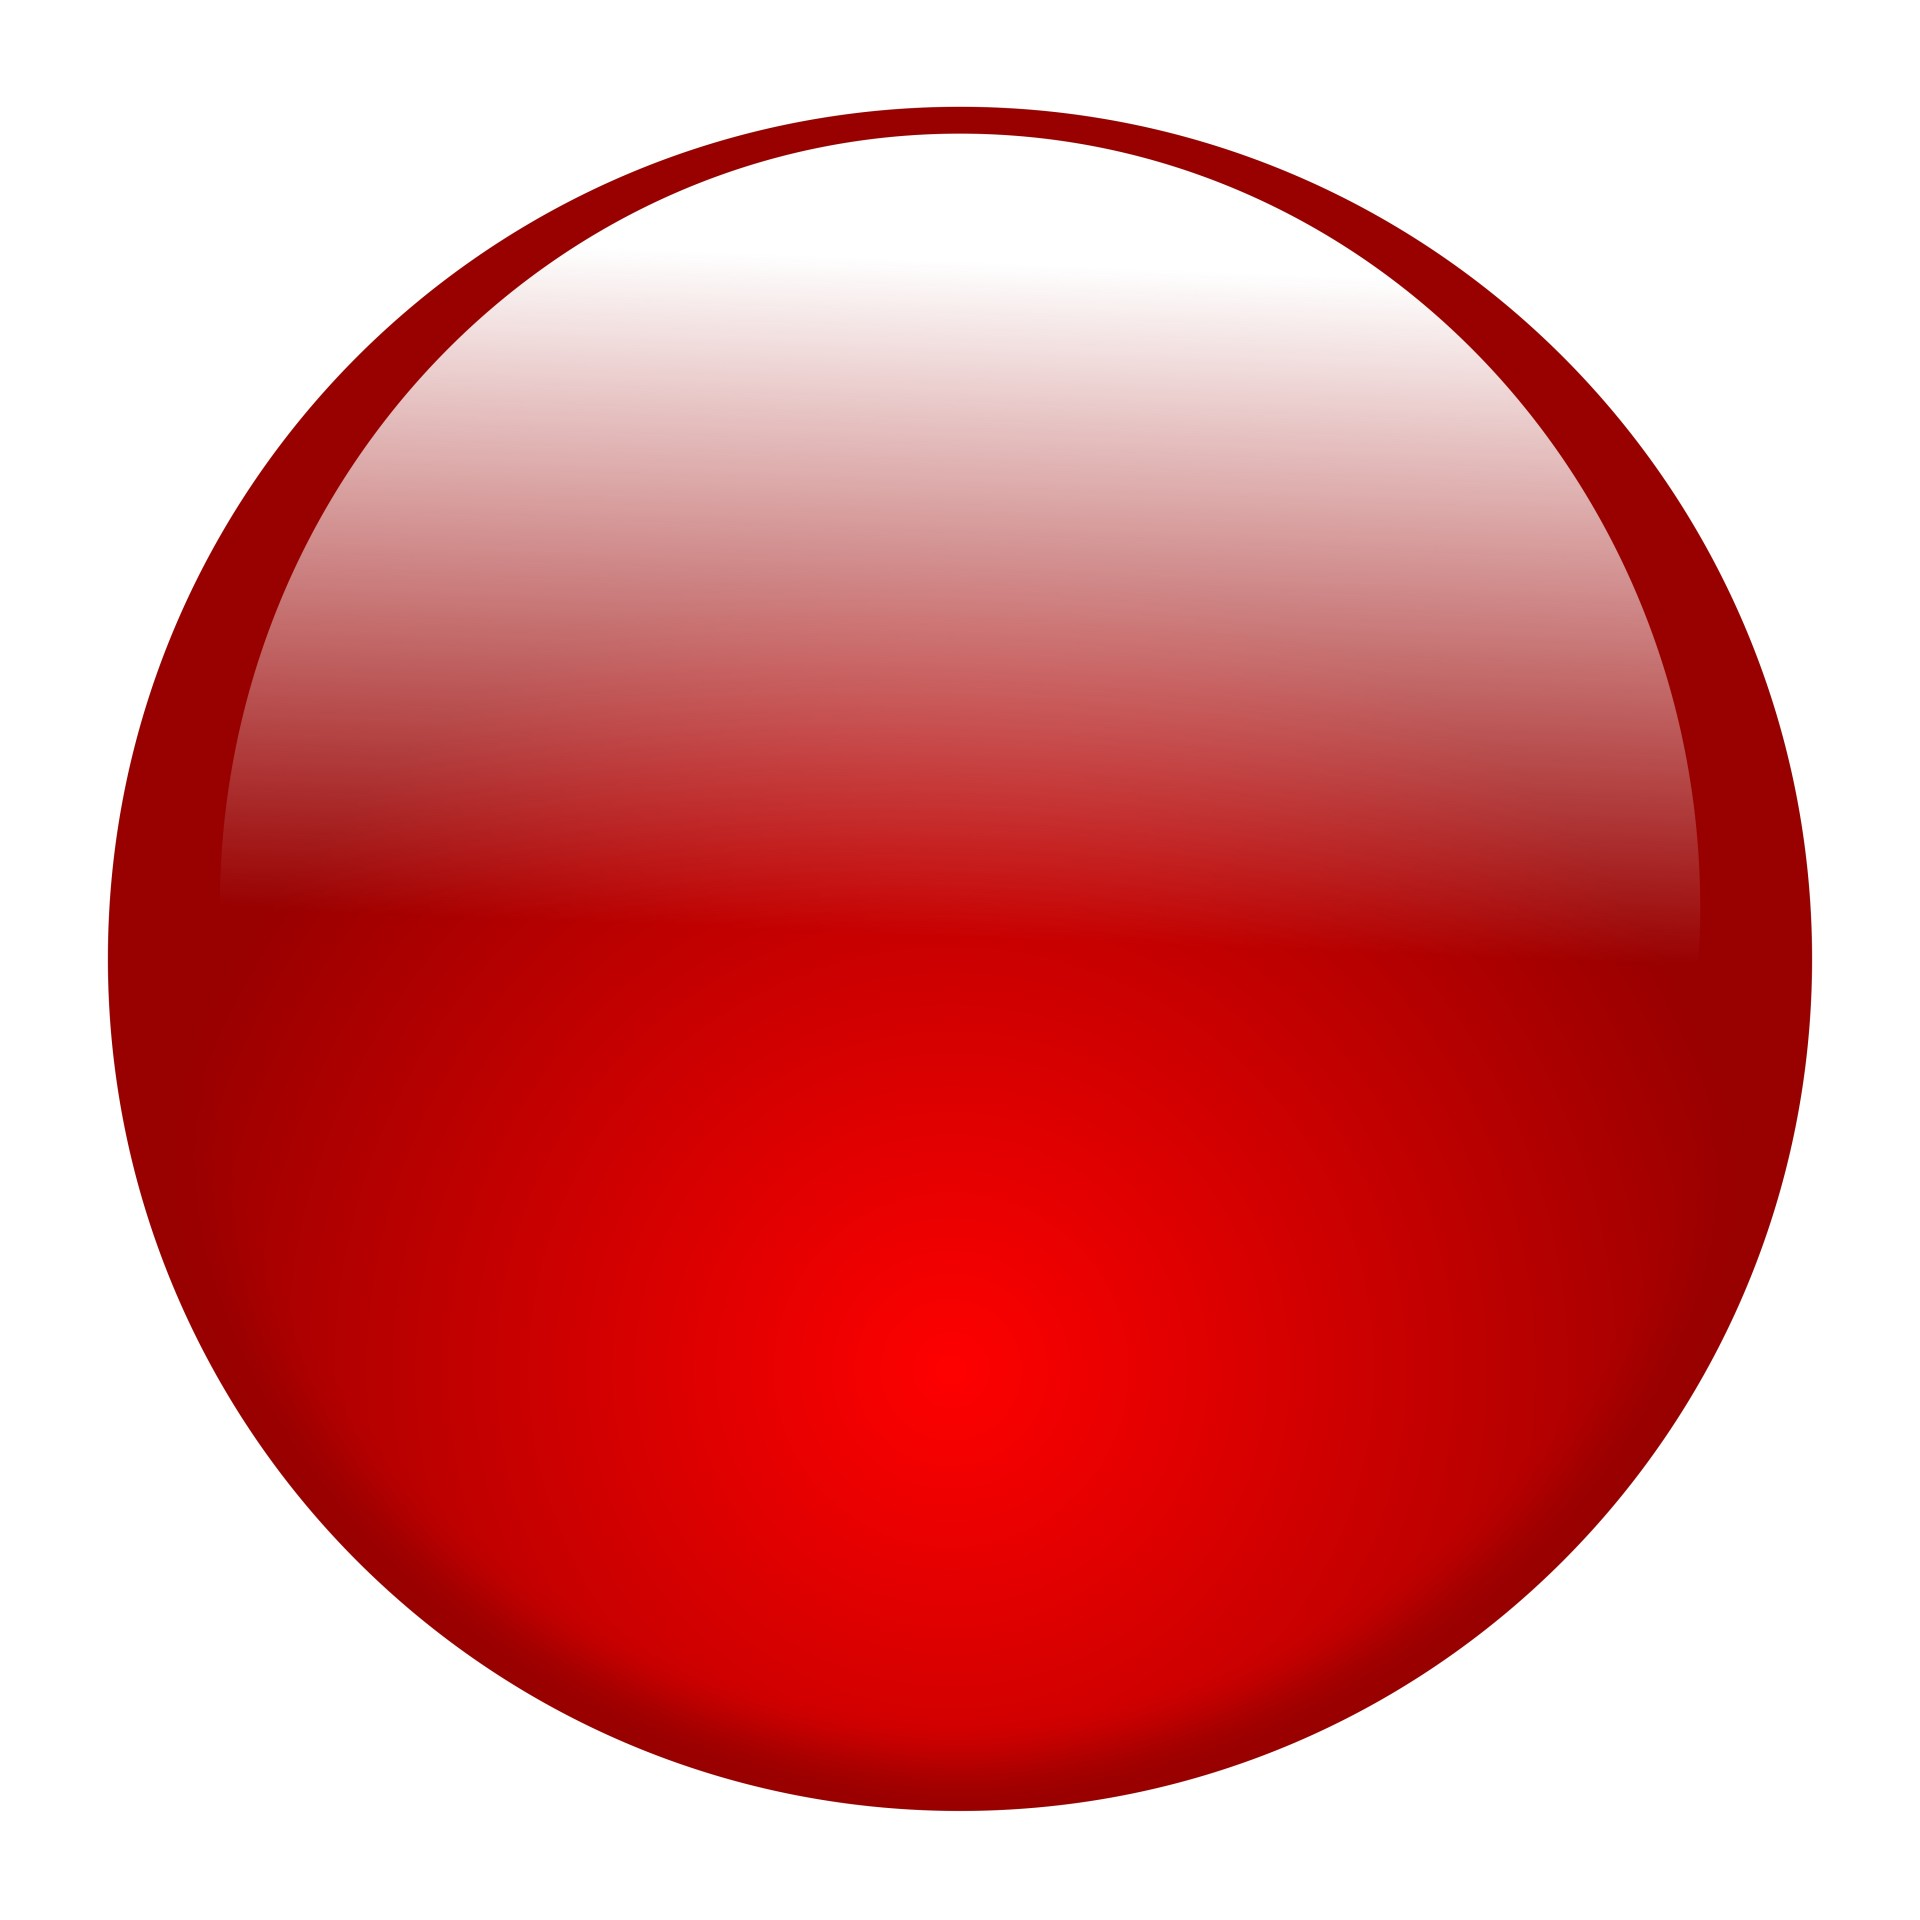 ярко красный шар картинка год казахстане умерло